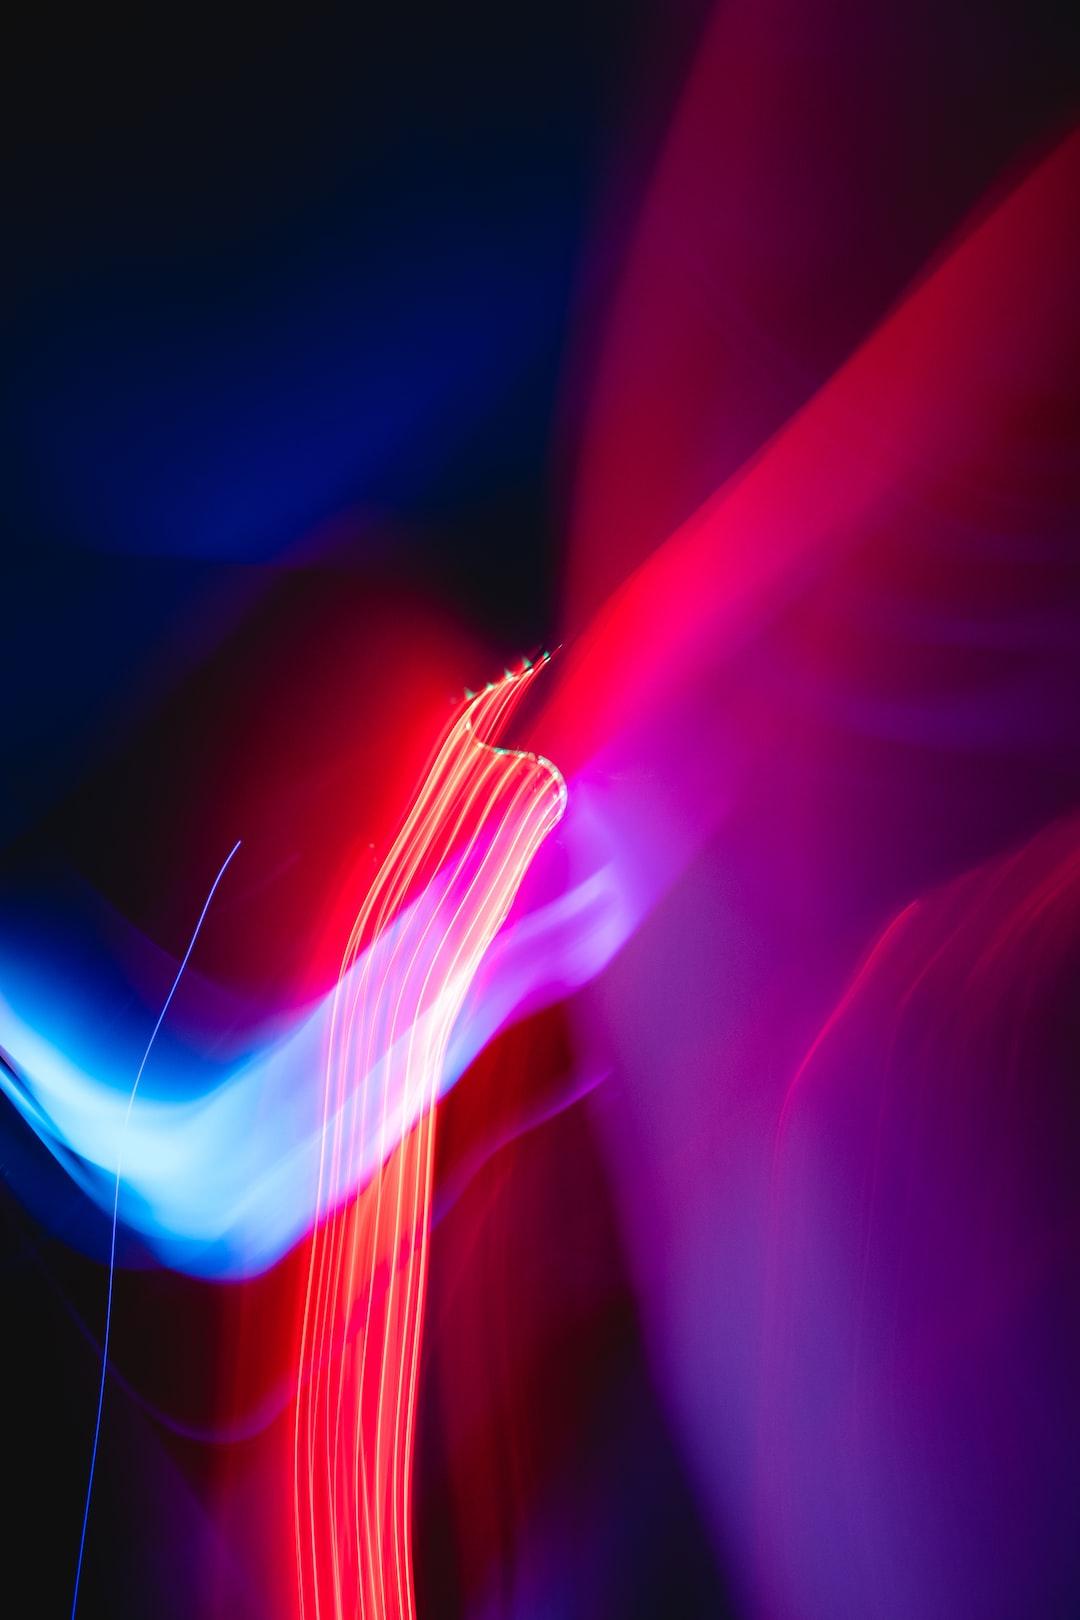 Neon Wallpapers: Free HD Download 500+ HQ   Unsplash